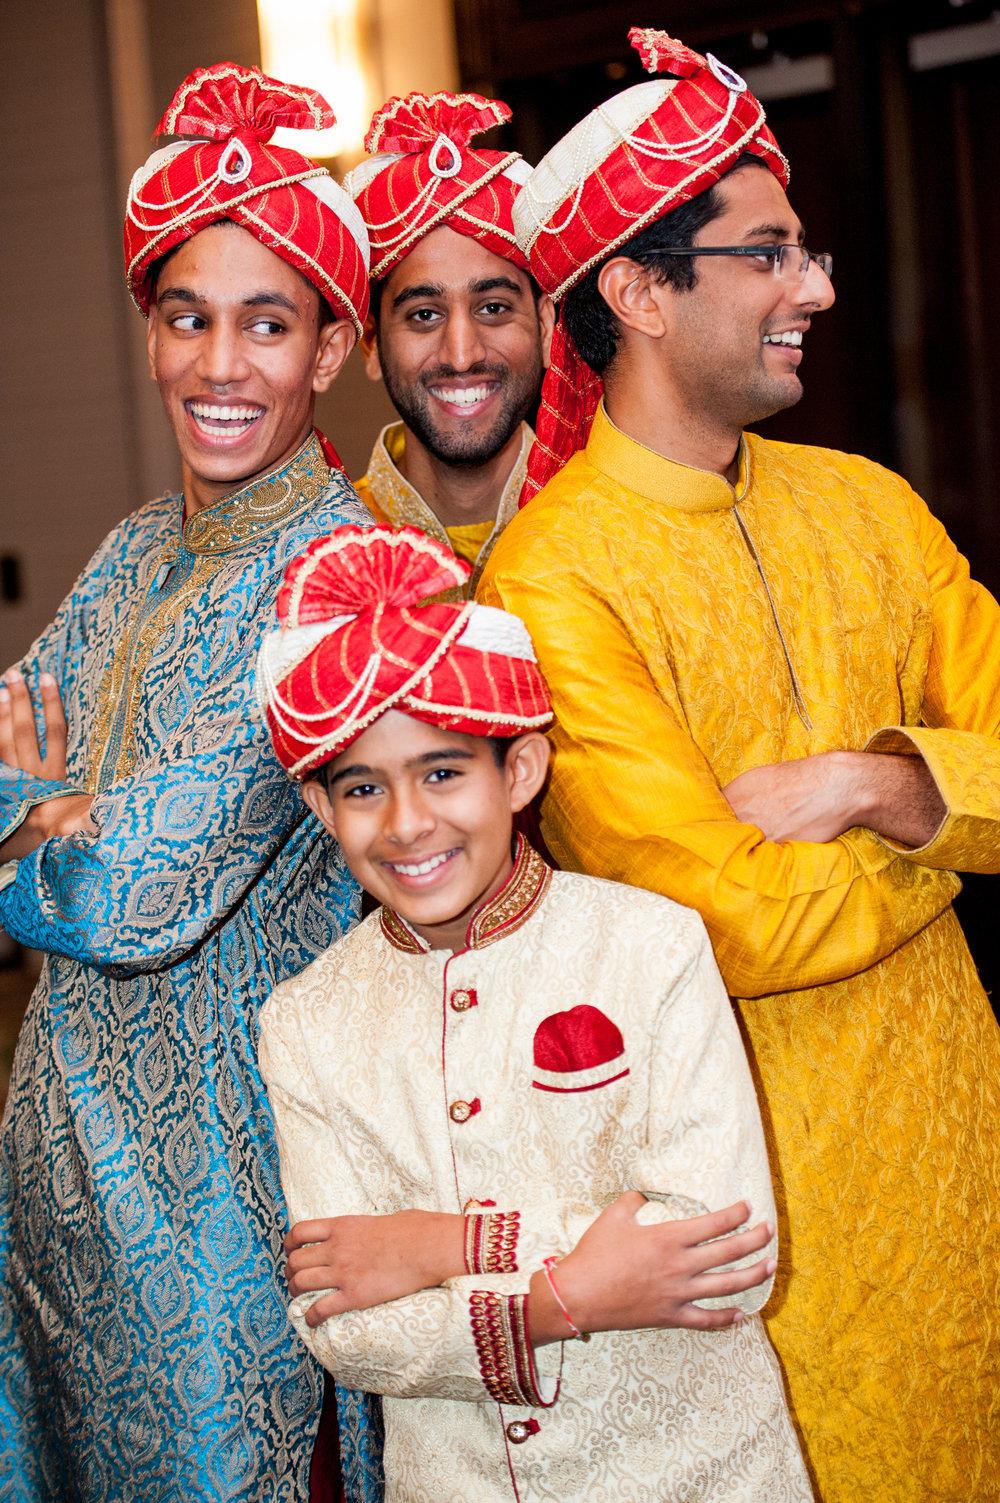 jonathan-mcphail-photography-nice-day-to-start-again-weddings-3731.jpg